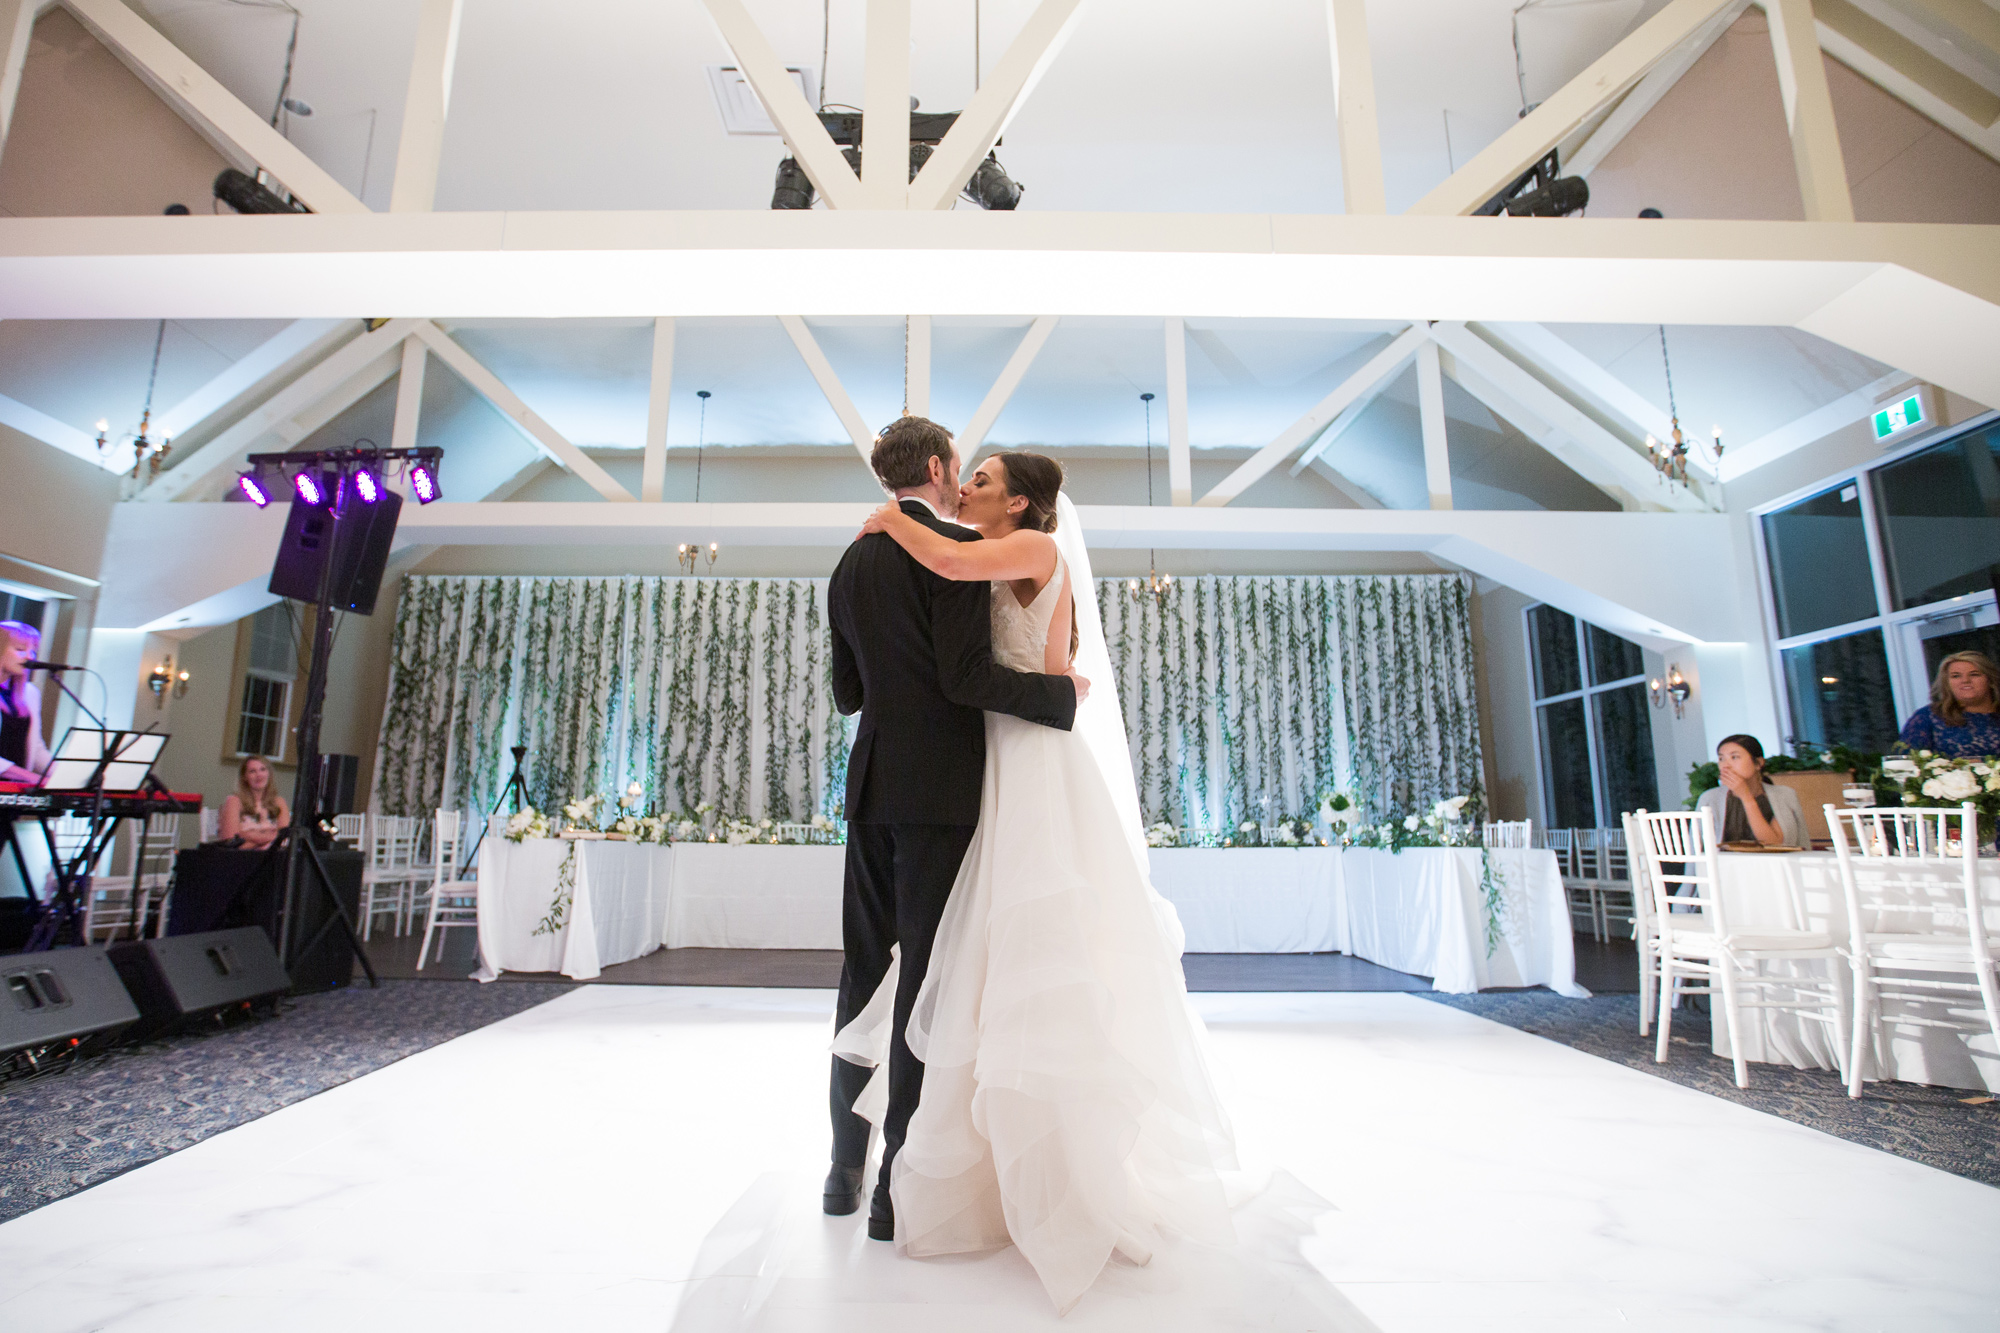 517-keltic-lodge-wedding-----------.jpg